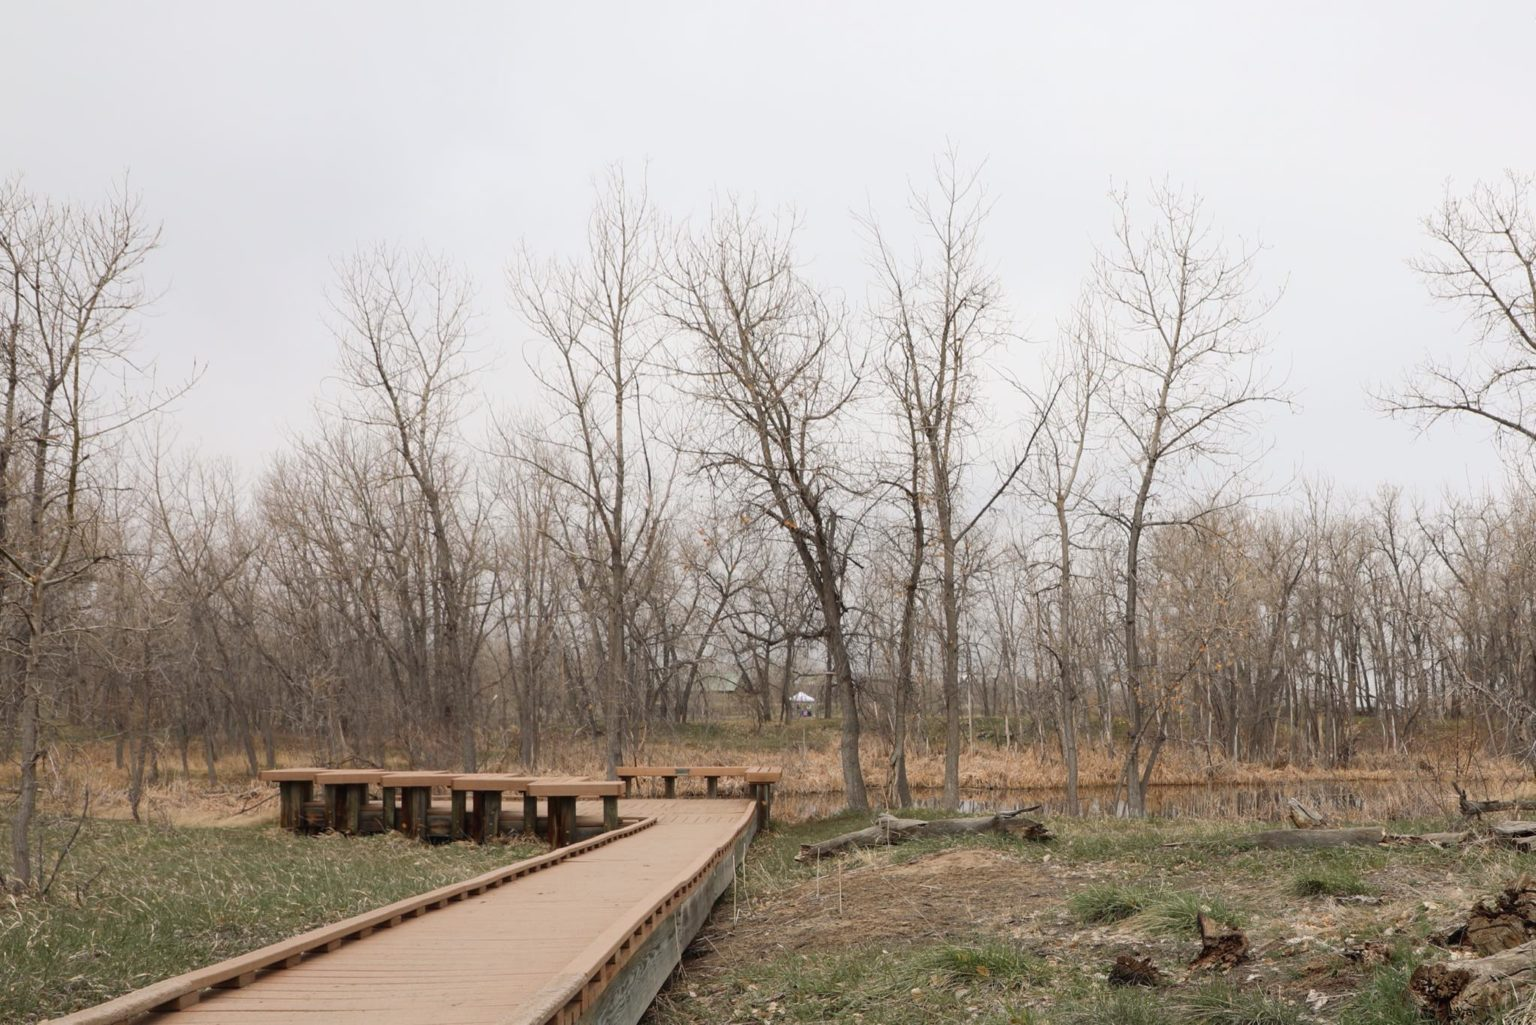 Observation area At Star K Ranch